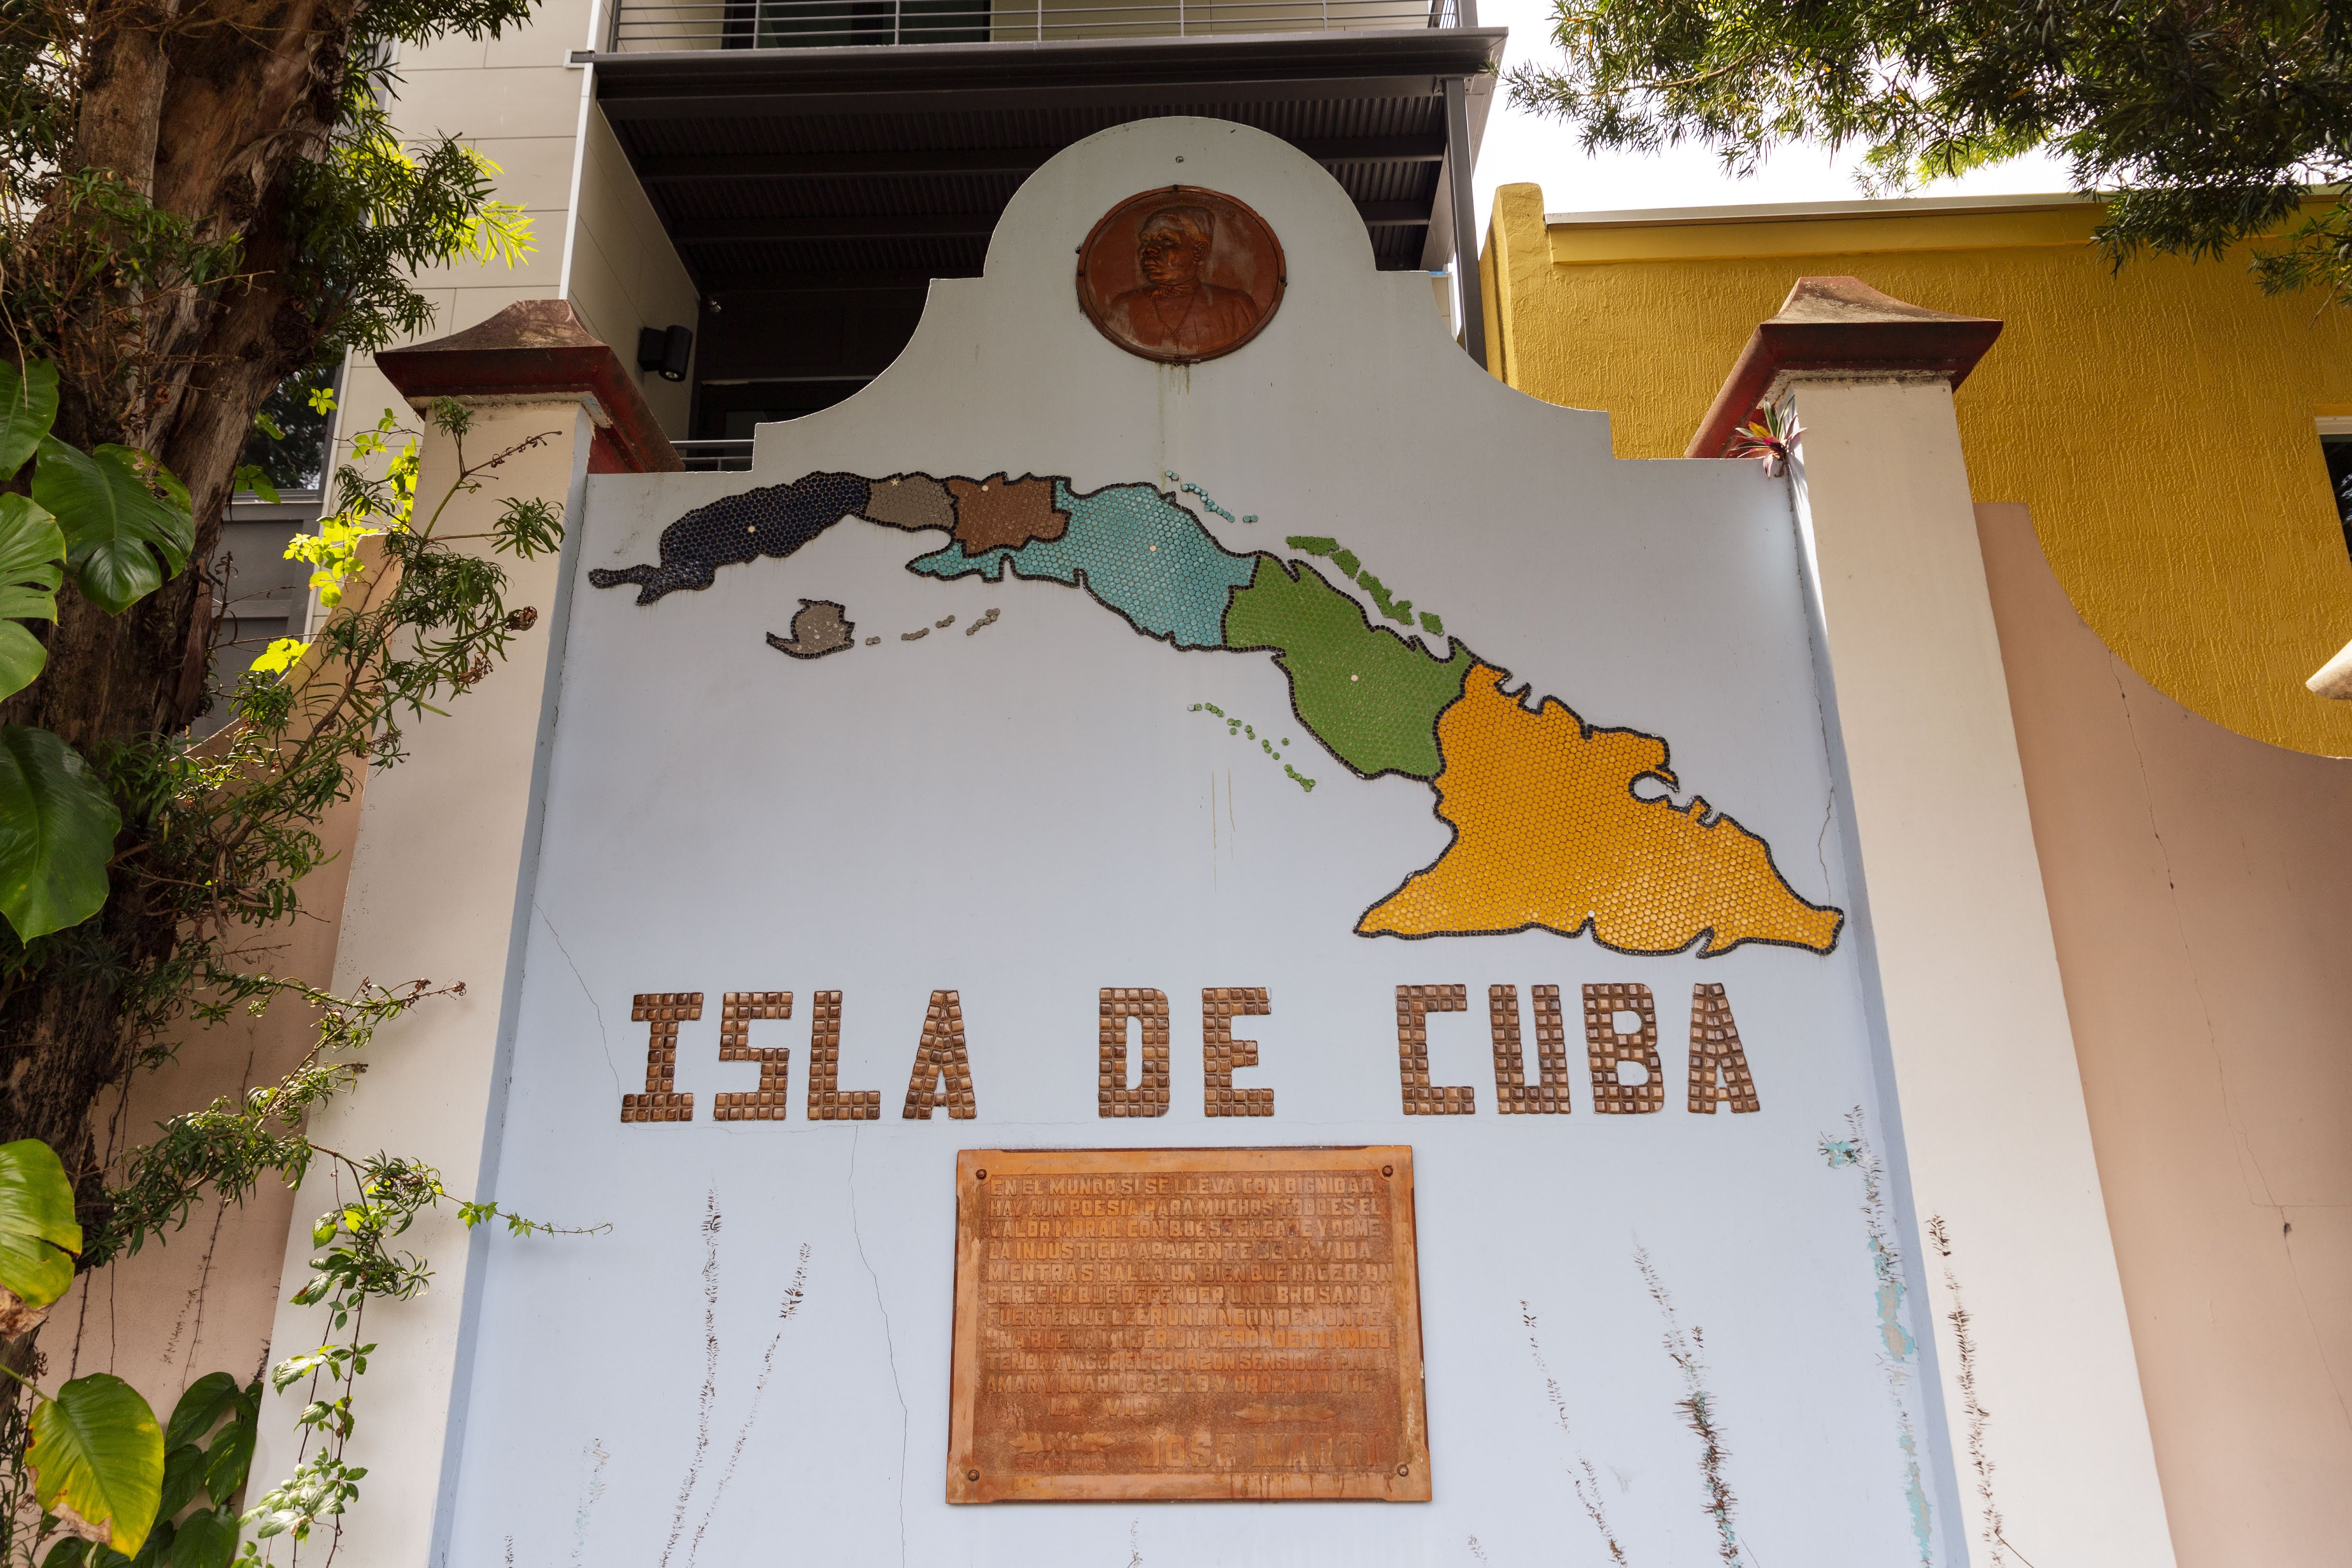 Isle de cuba